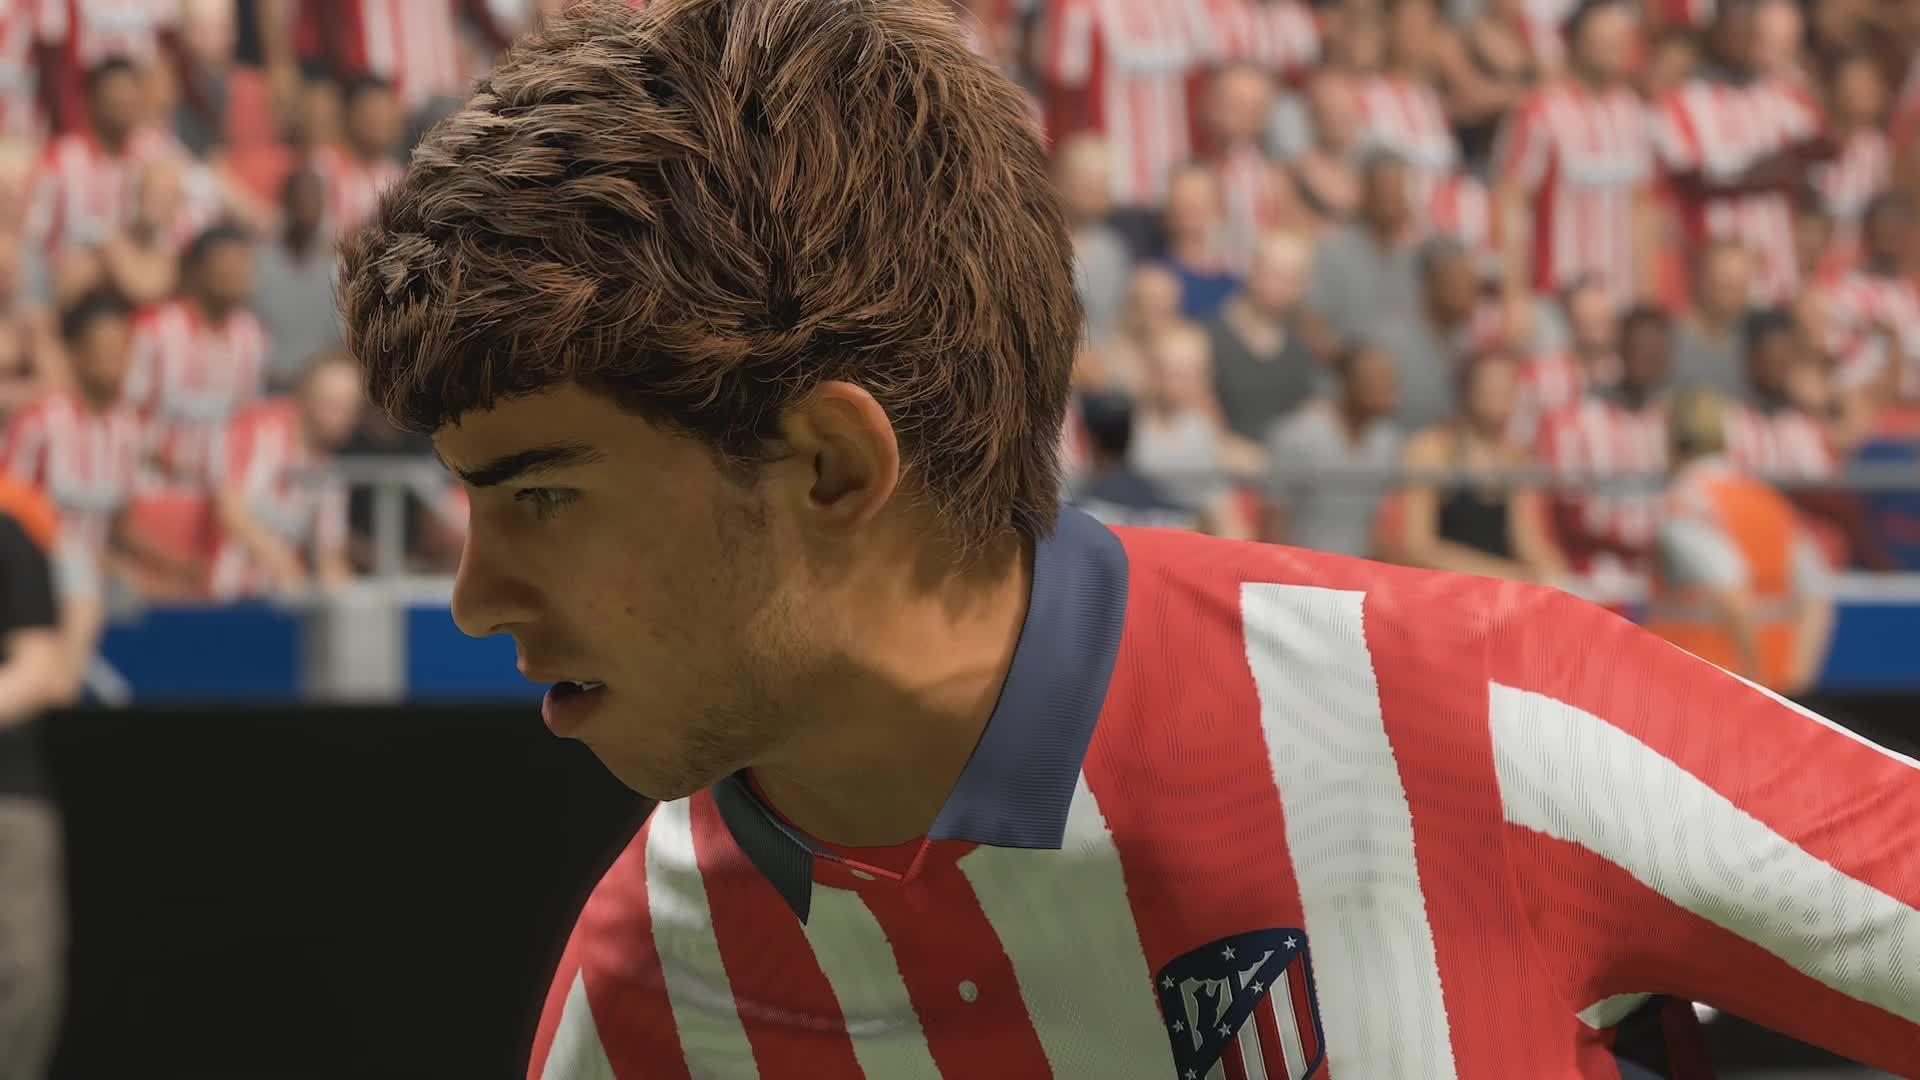 FIFA 21次世代,菲利克斯的头发在运动时的飘逸效果……